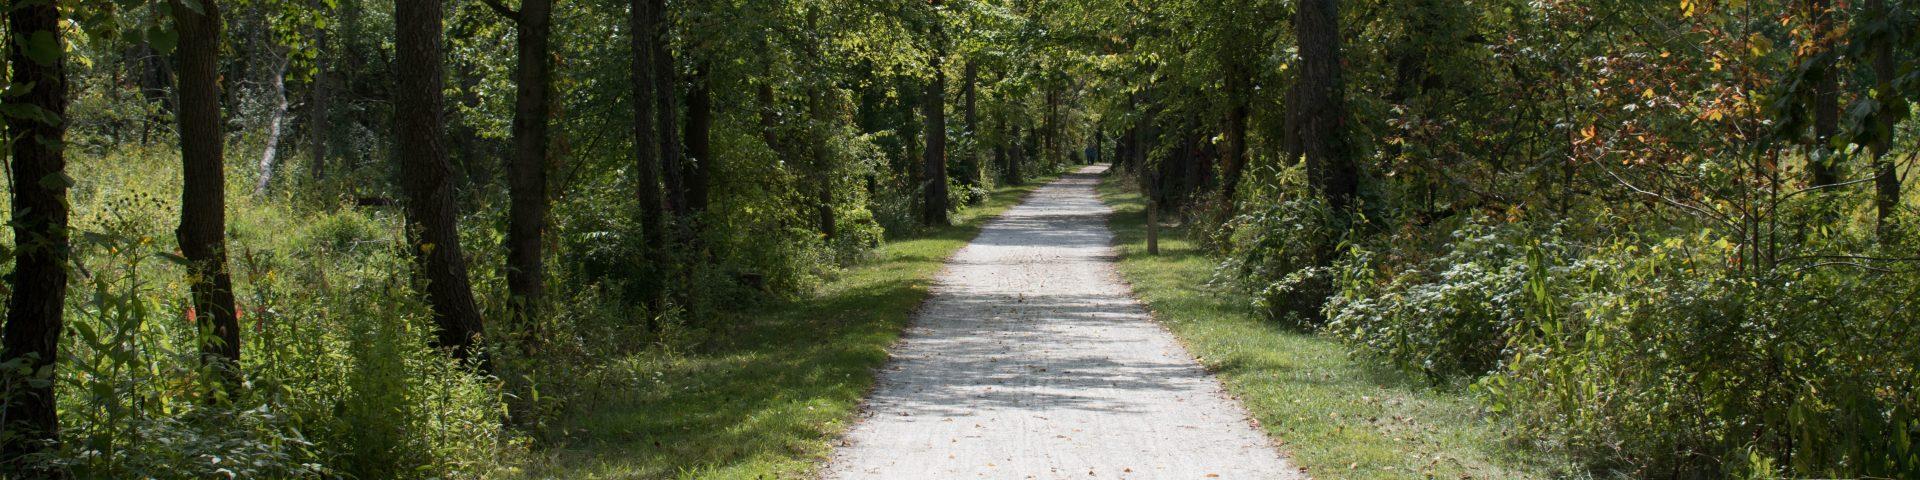 Towpath Trail Cuyahoga National Park